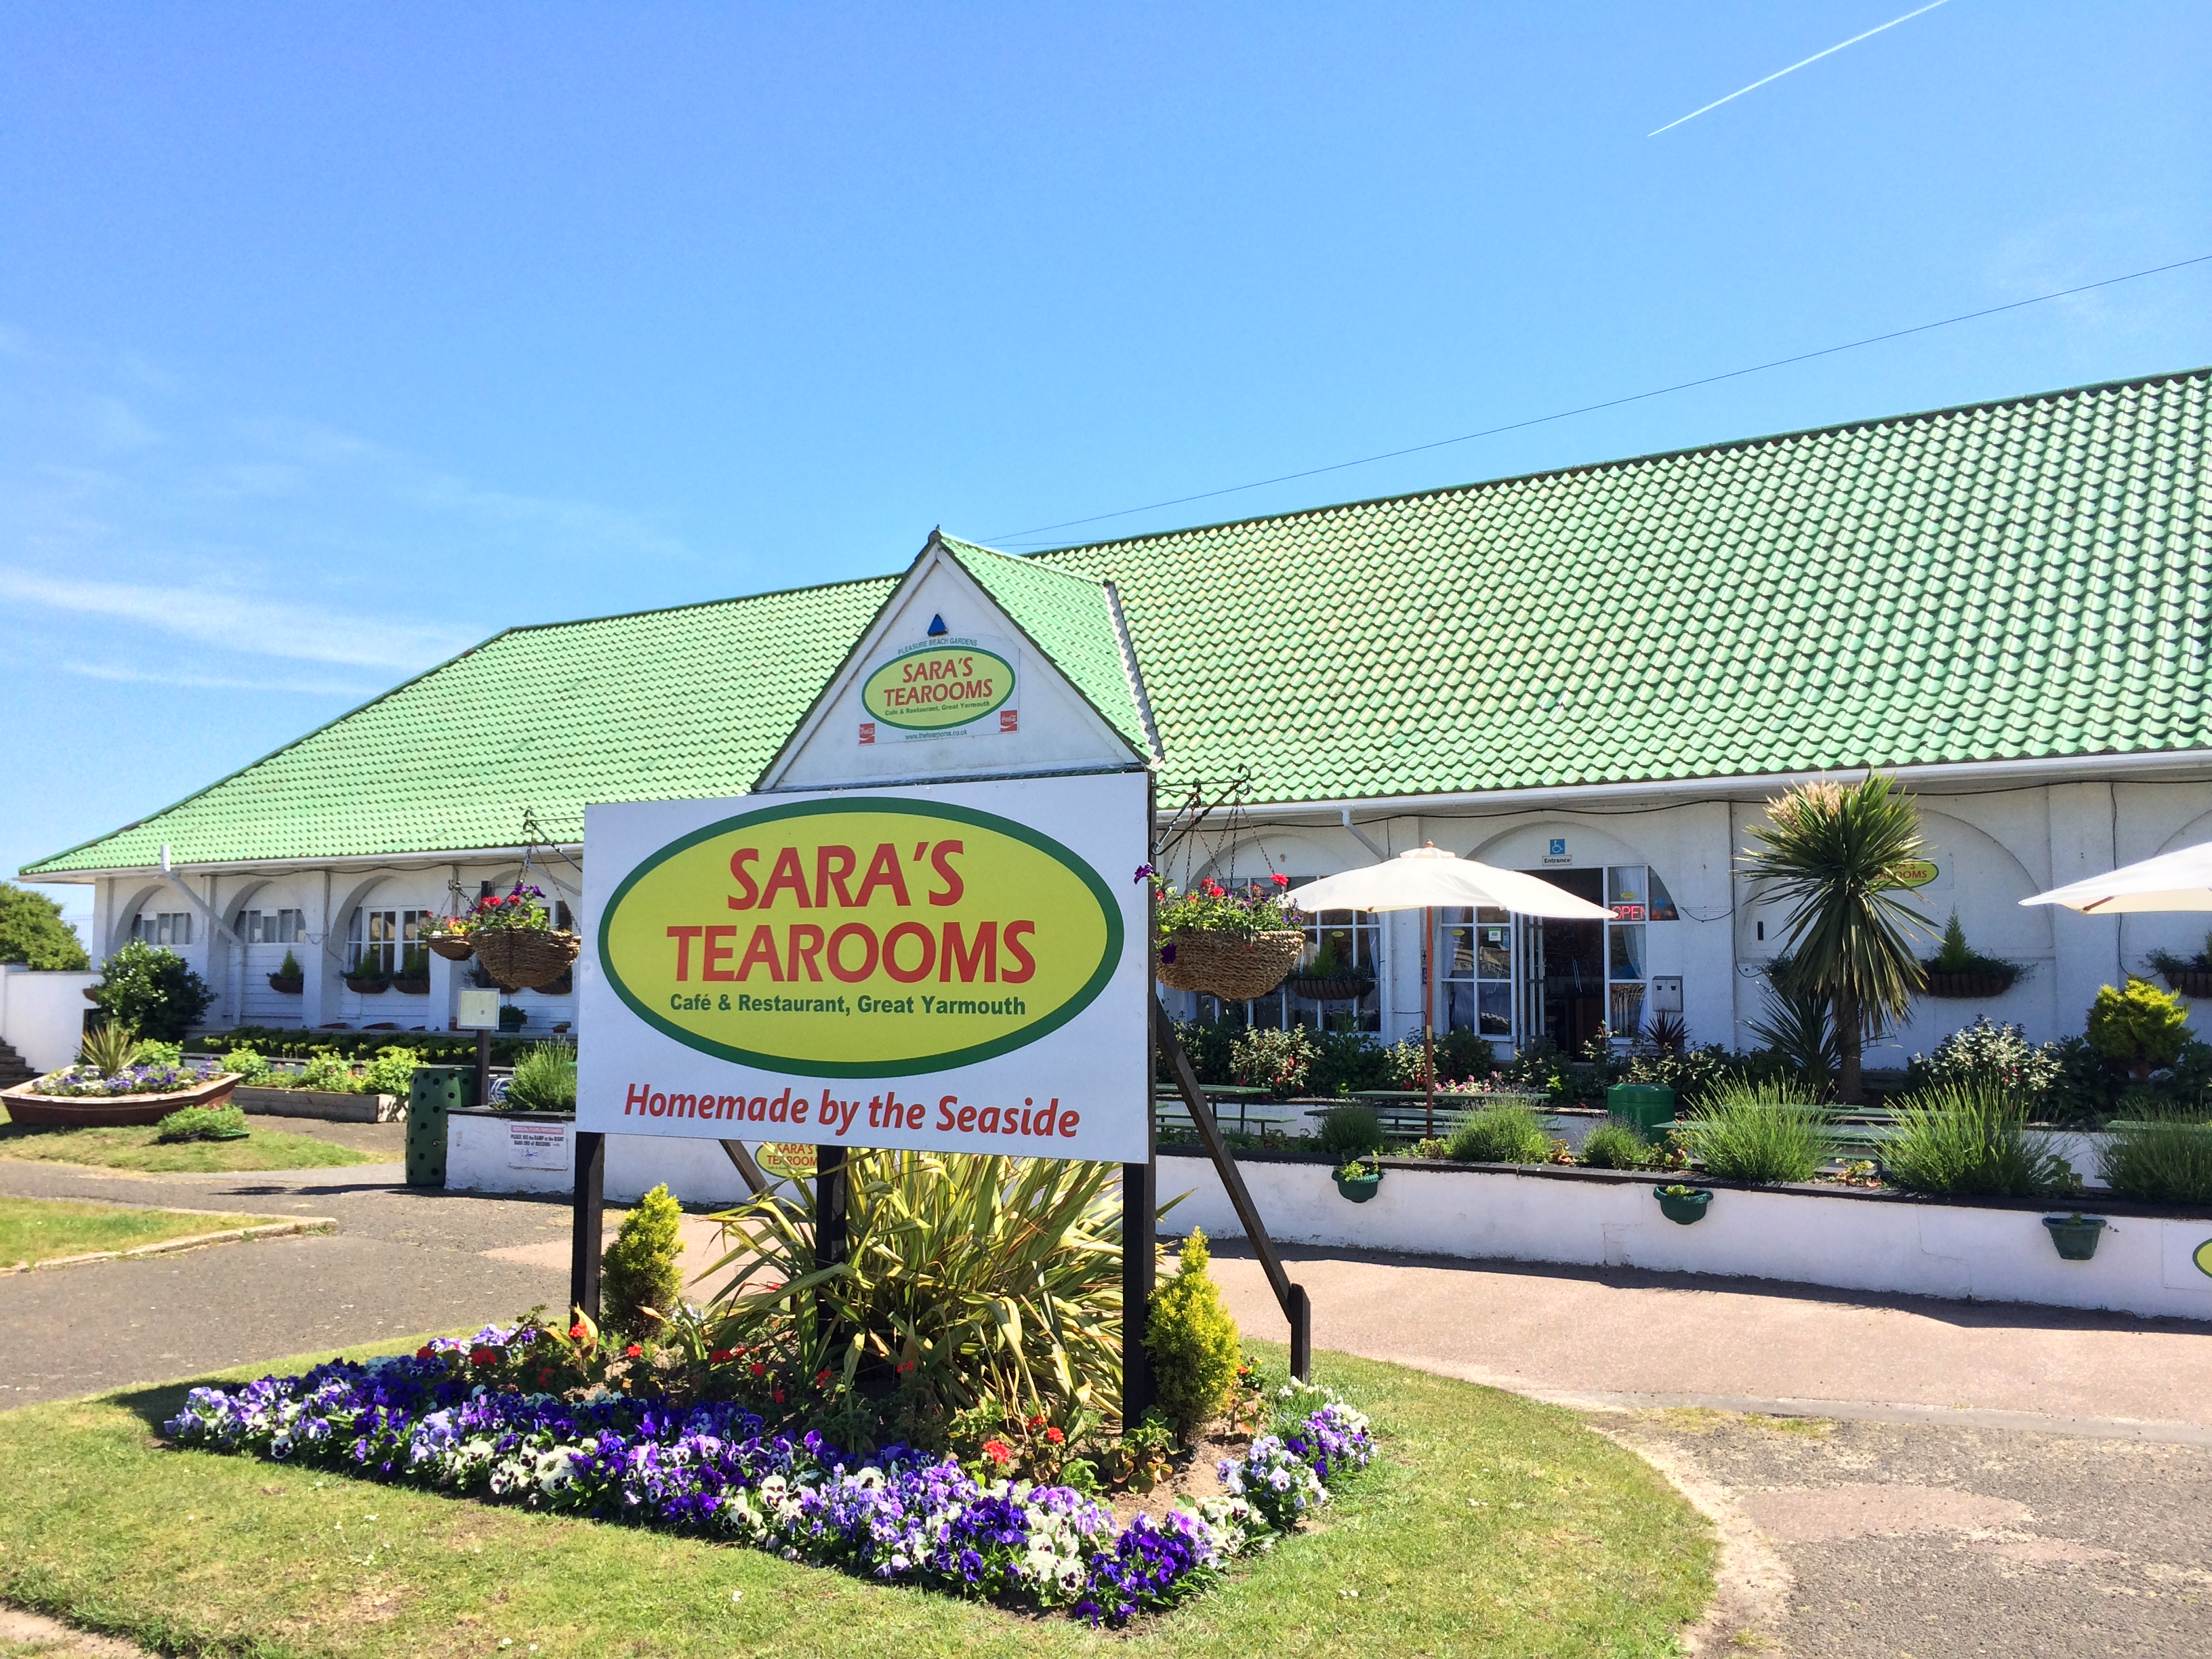 Sara's Tearooms